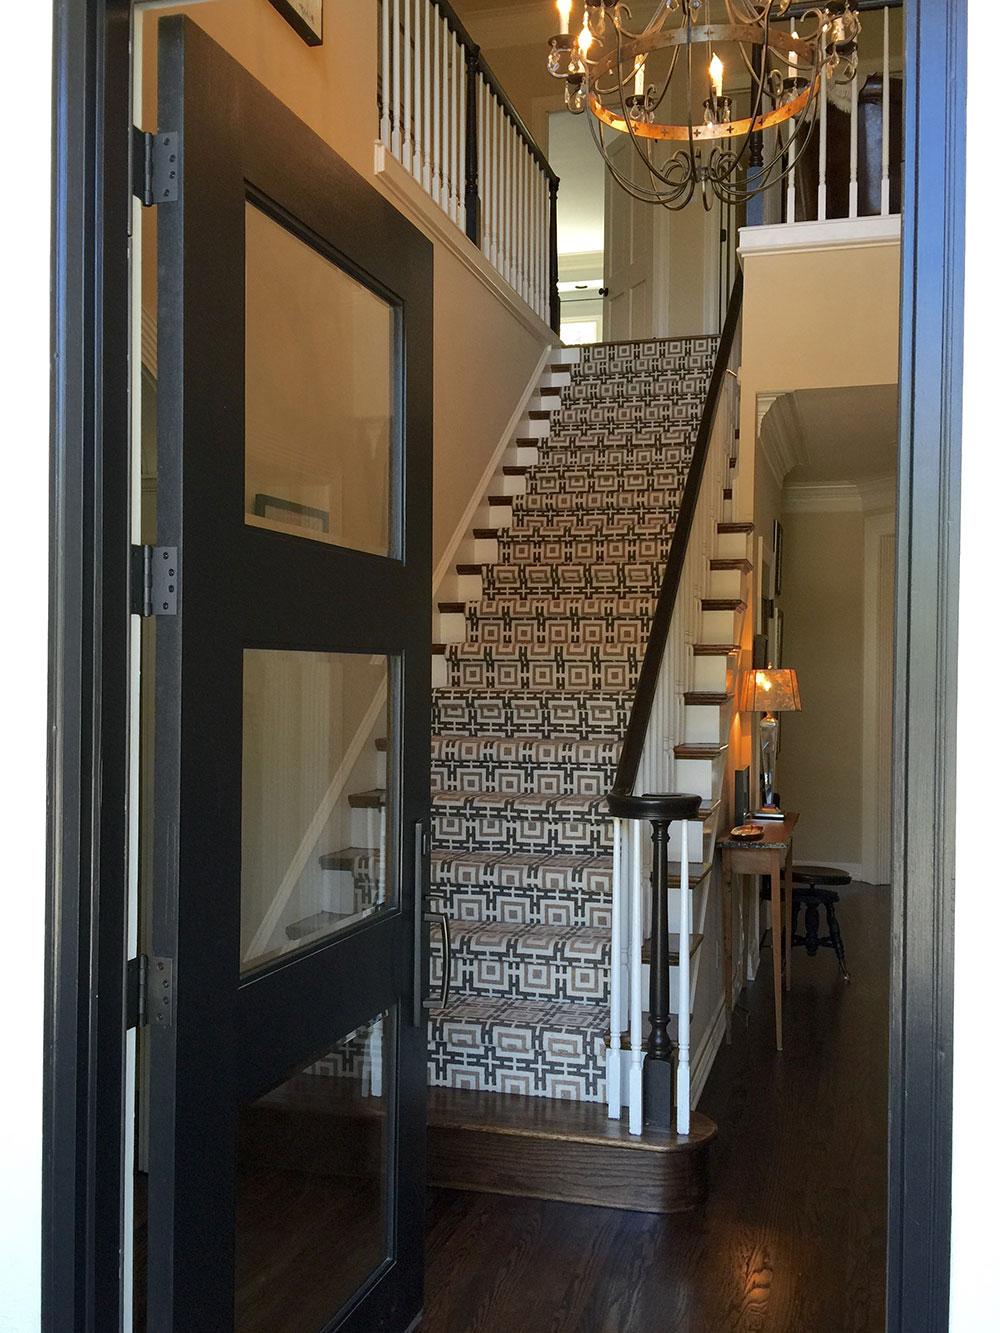 Cl-stairs-1.jpg